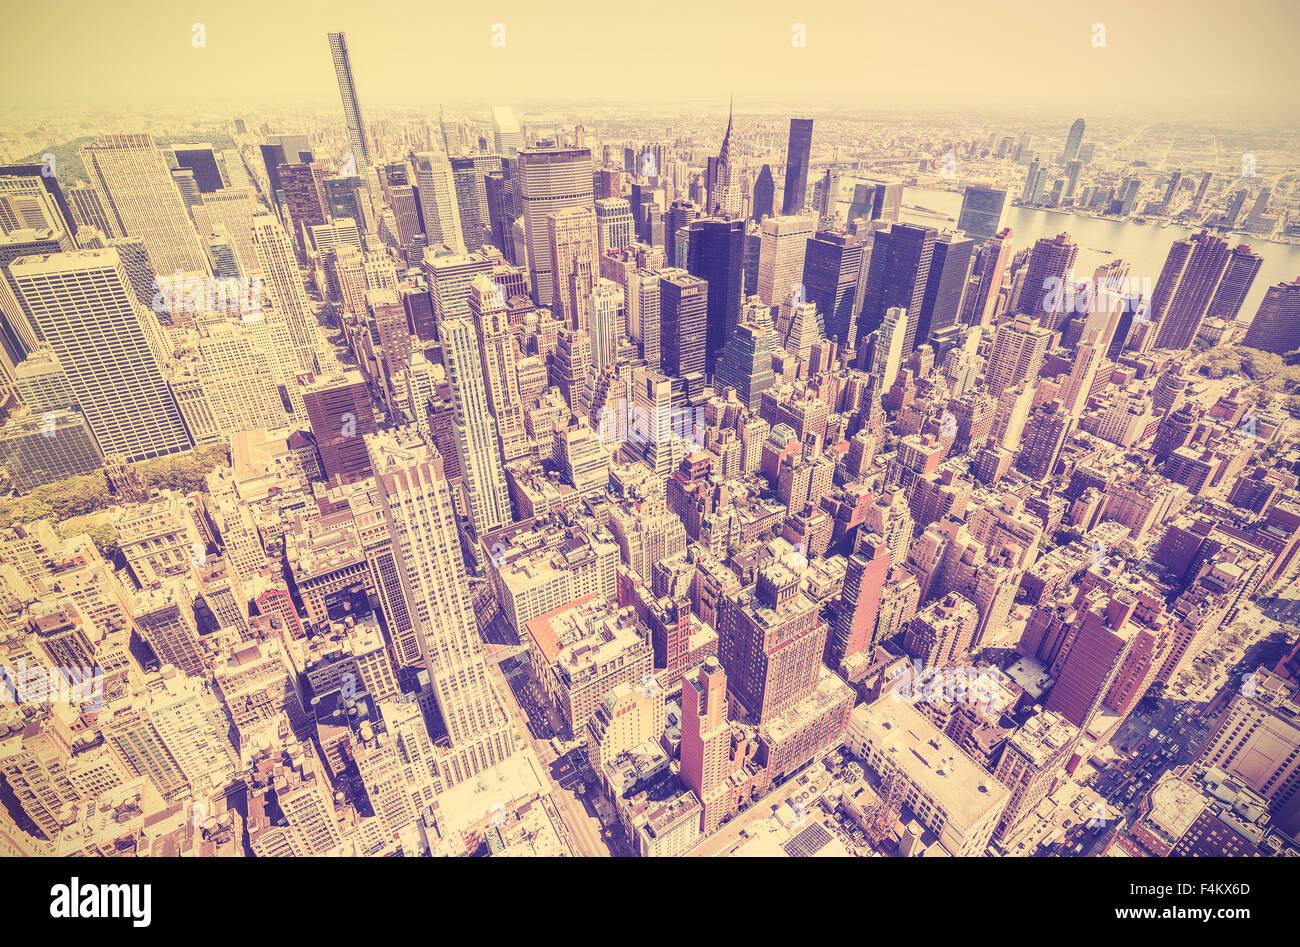 Vintage Retro getönten Blick auf Manhattan, New York City, USA Stockbild